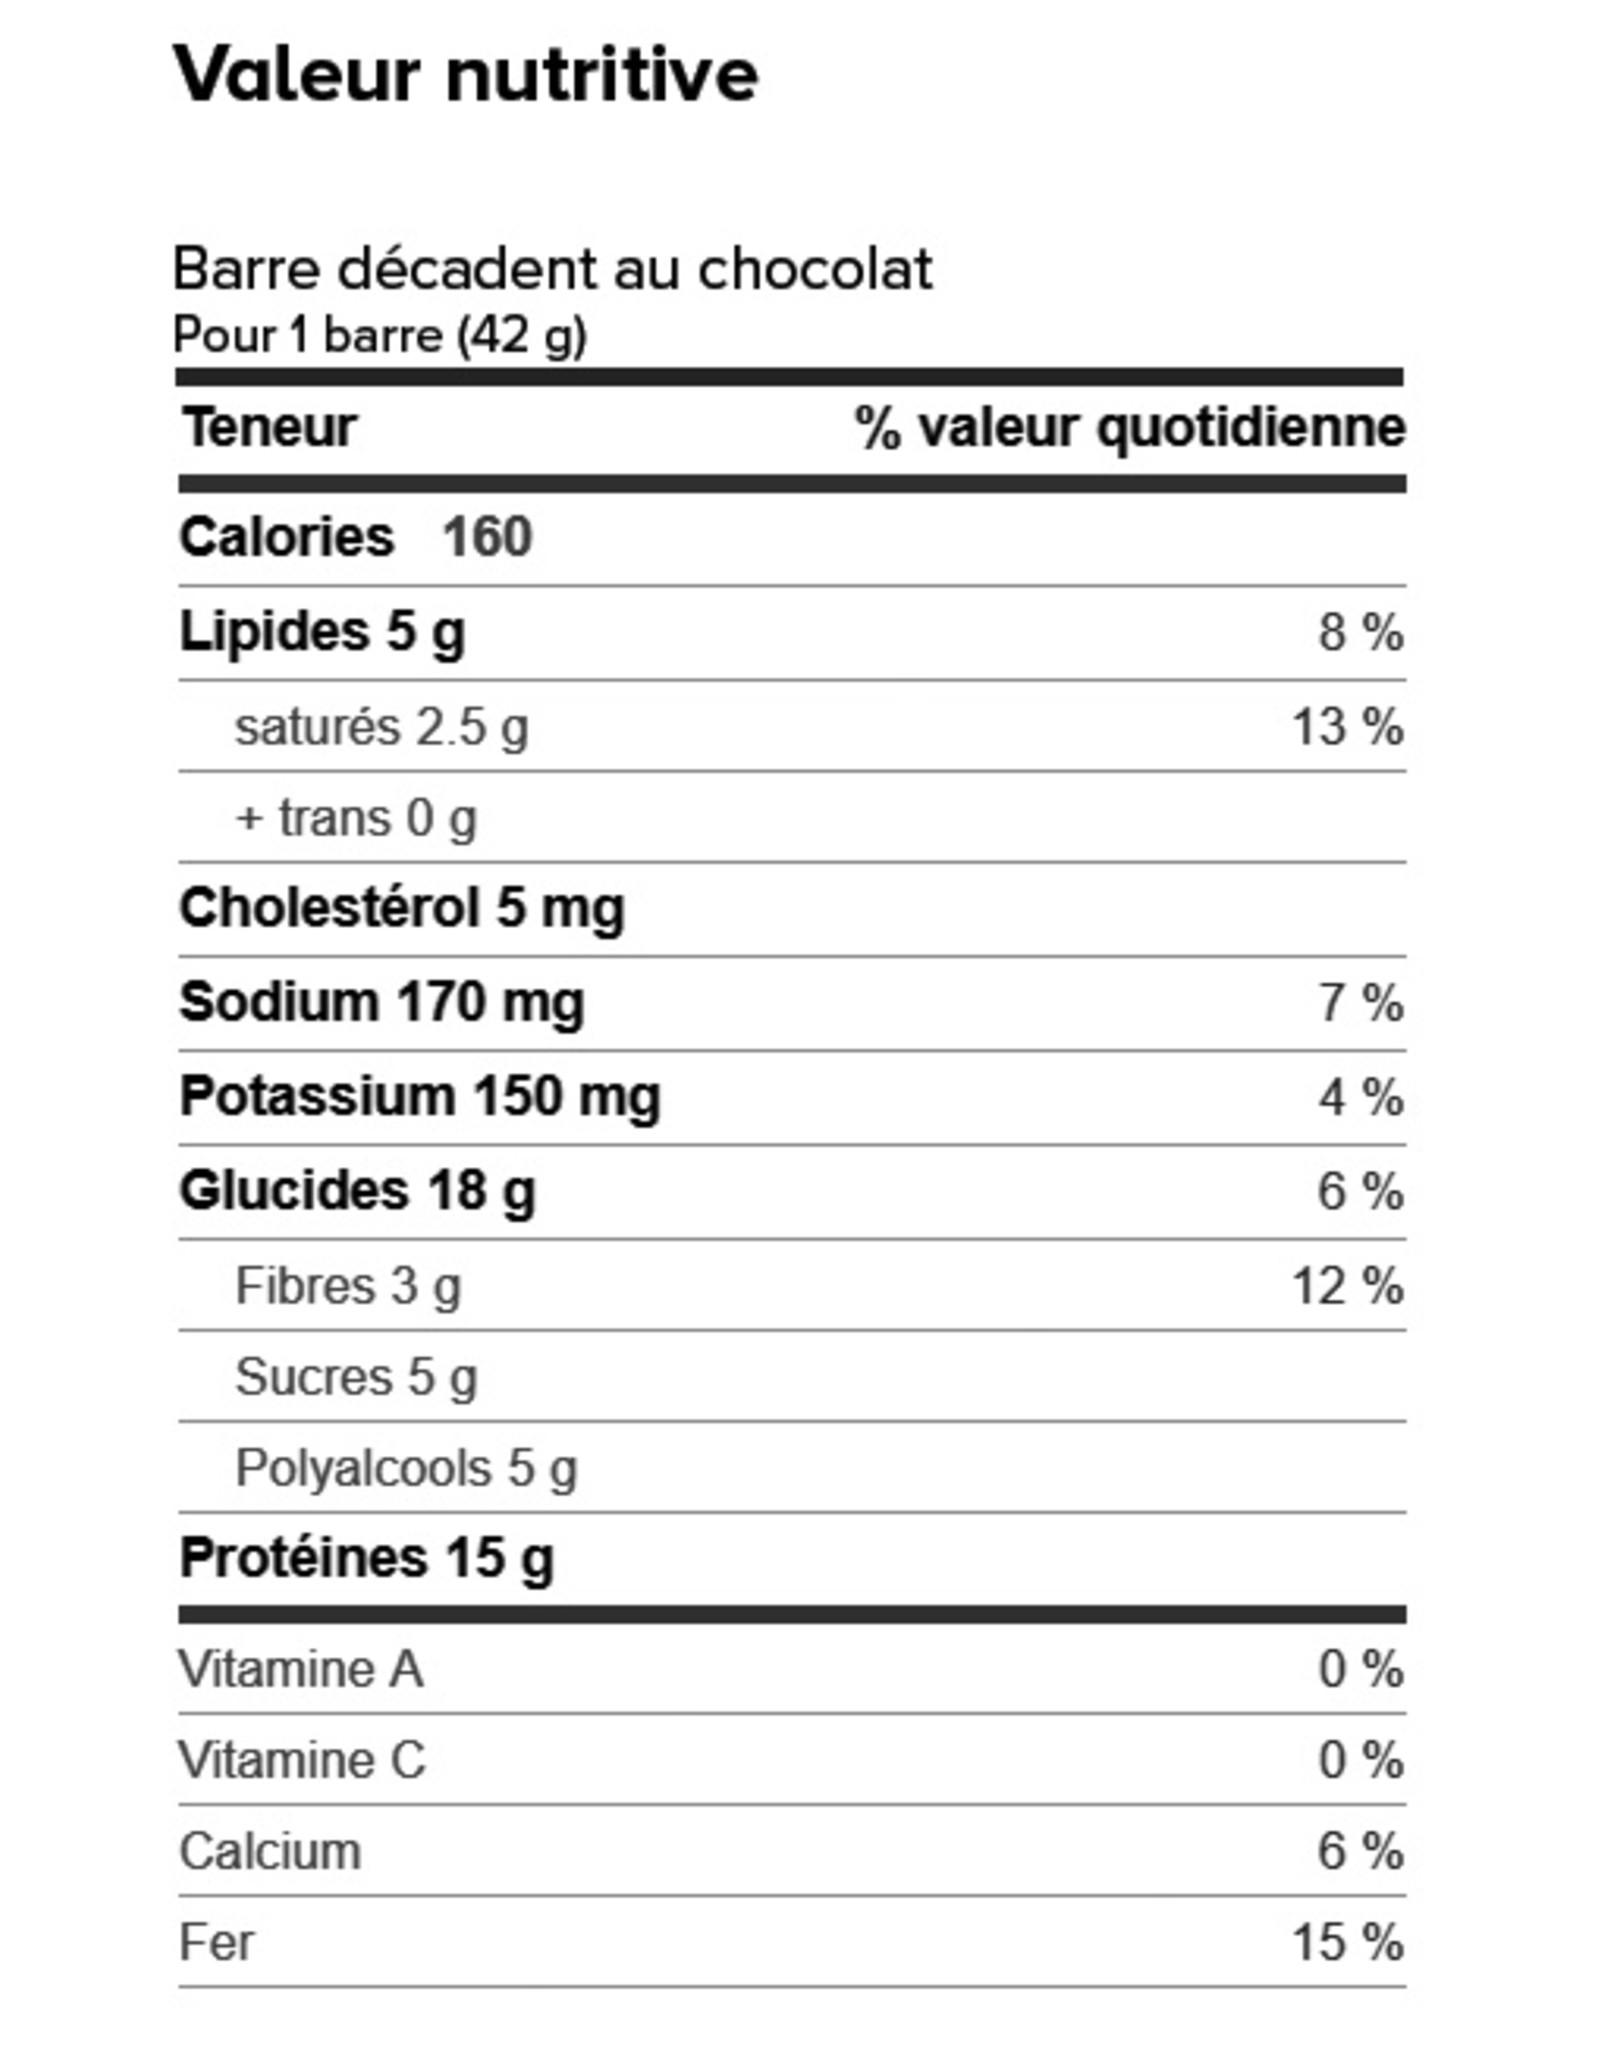 Proti-Bar Boite (1 x 7) BARRE DÉCADENT AU CHOCOLAT